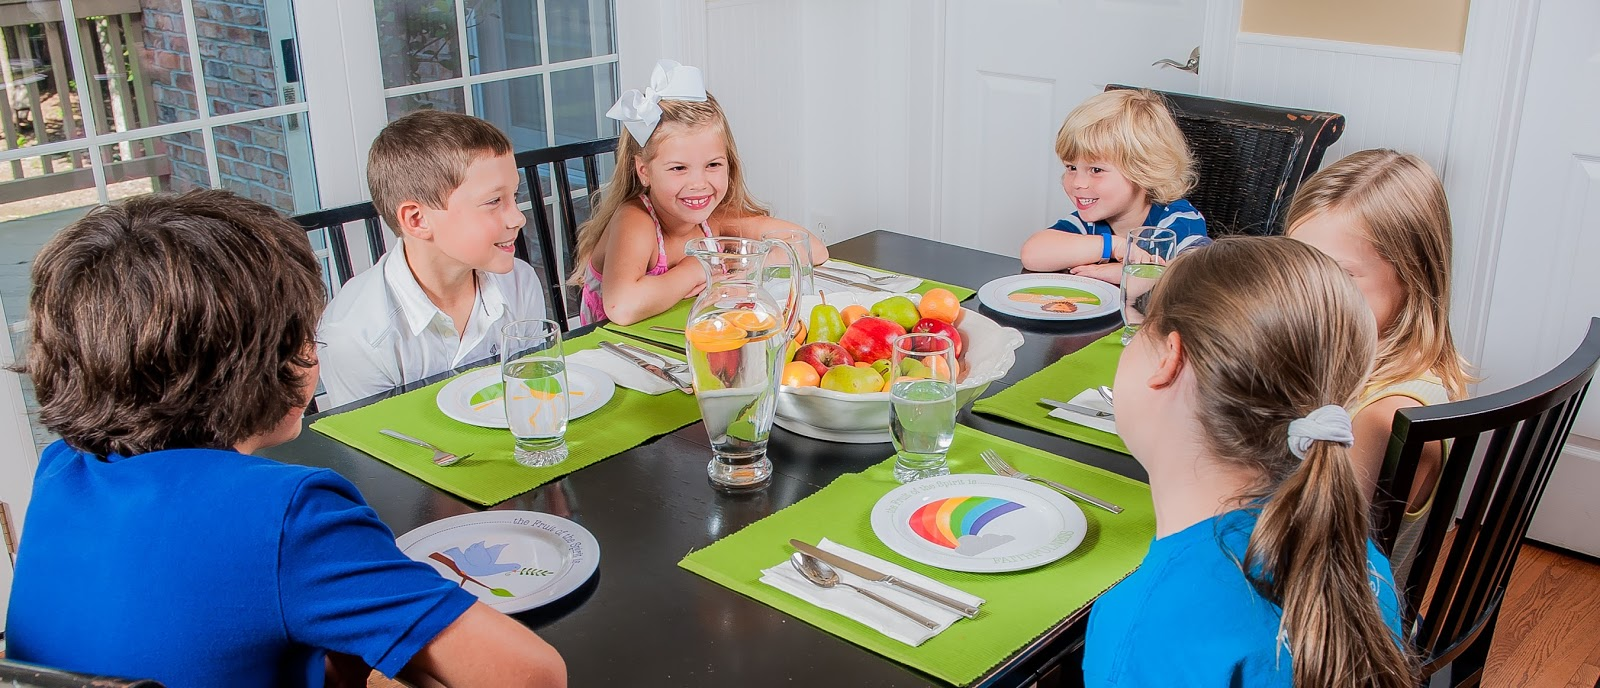 #FruitfulKids #kidsplates